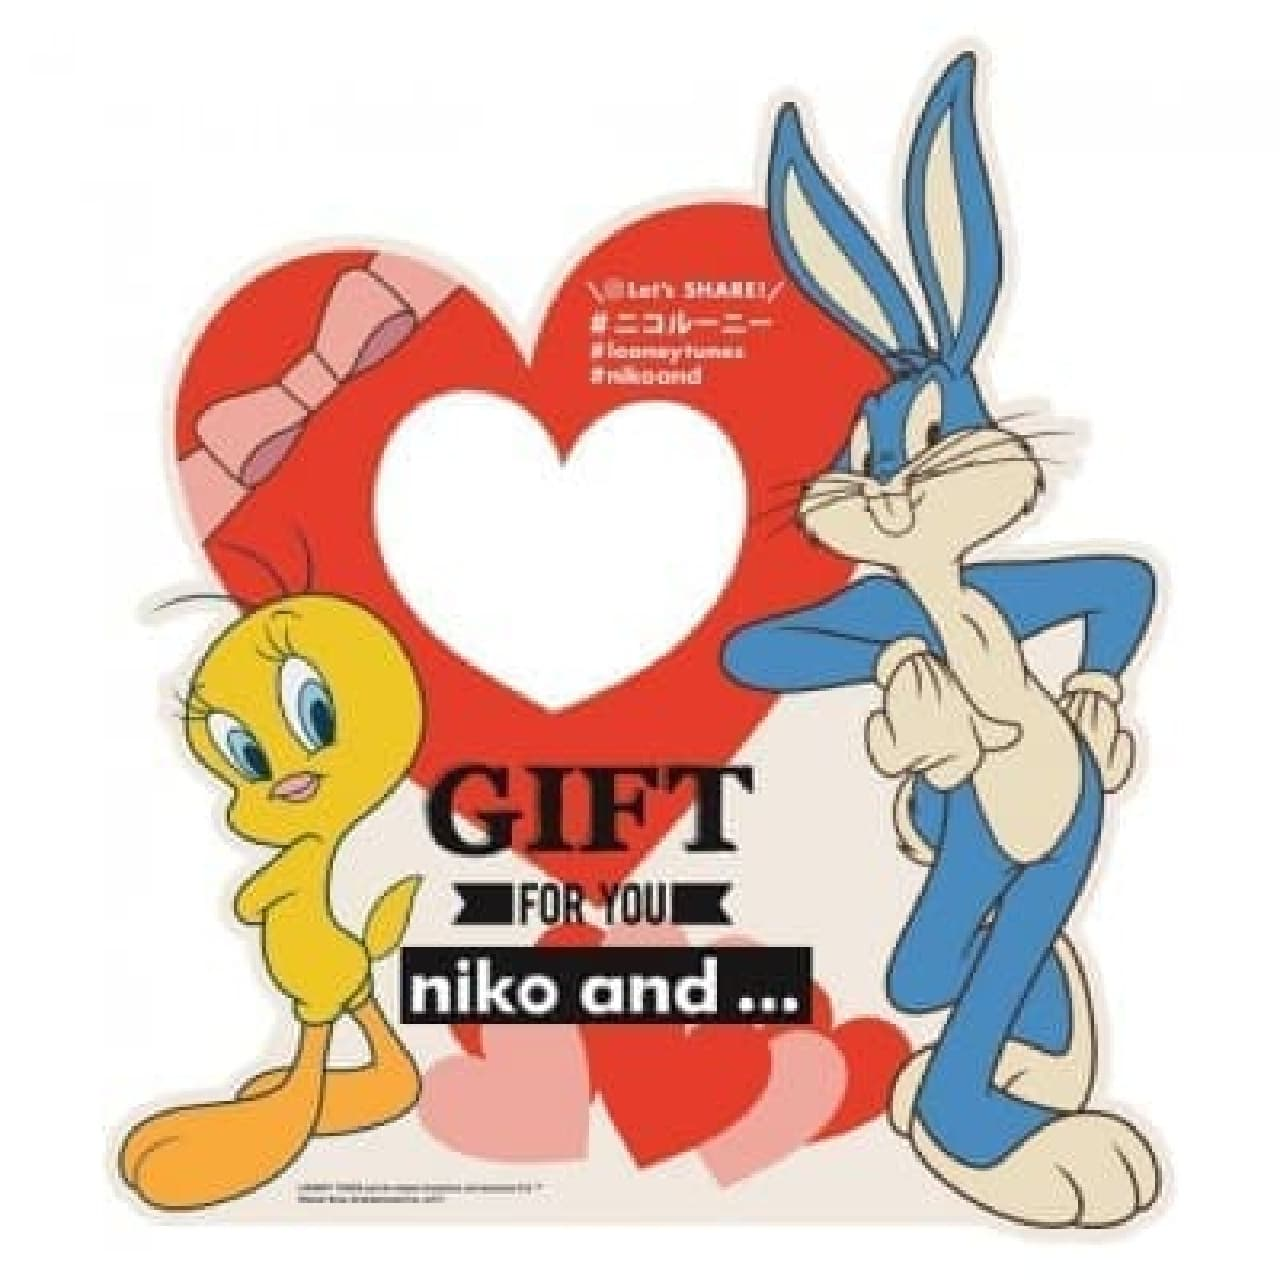 「niko and ...」×「ルーニー・テューンズ」コラボ雑貨